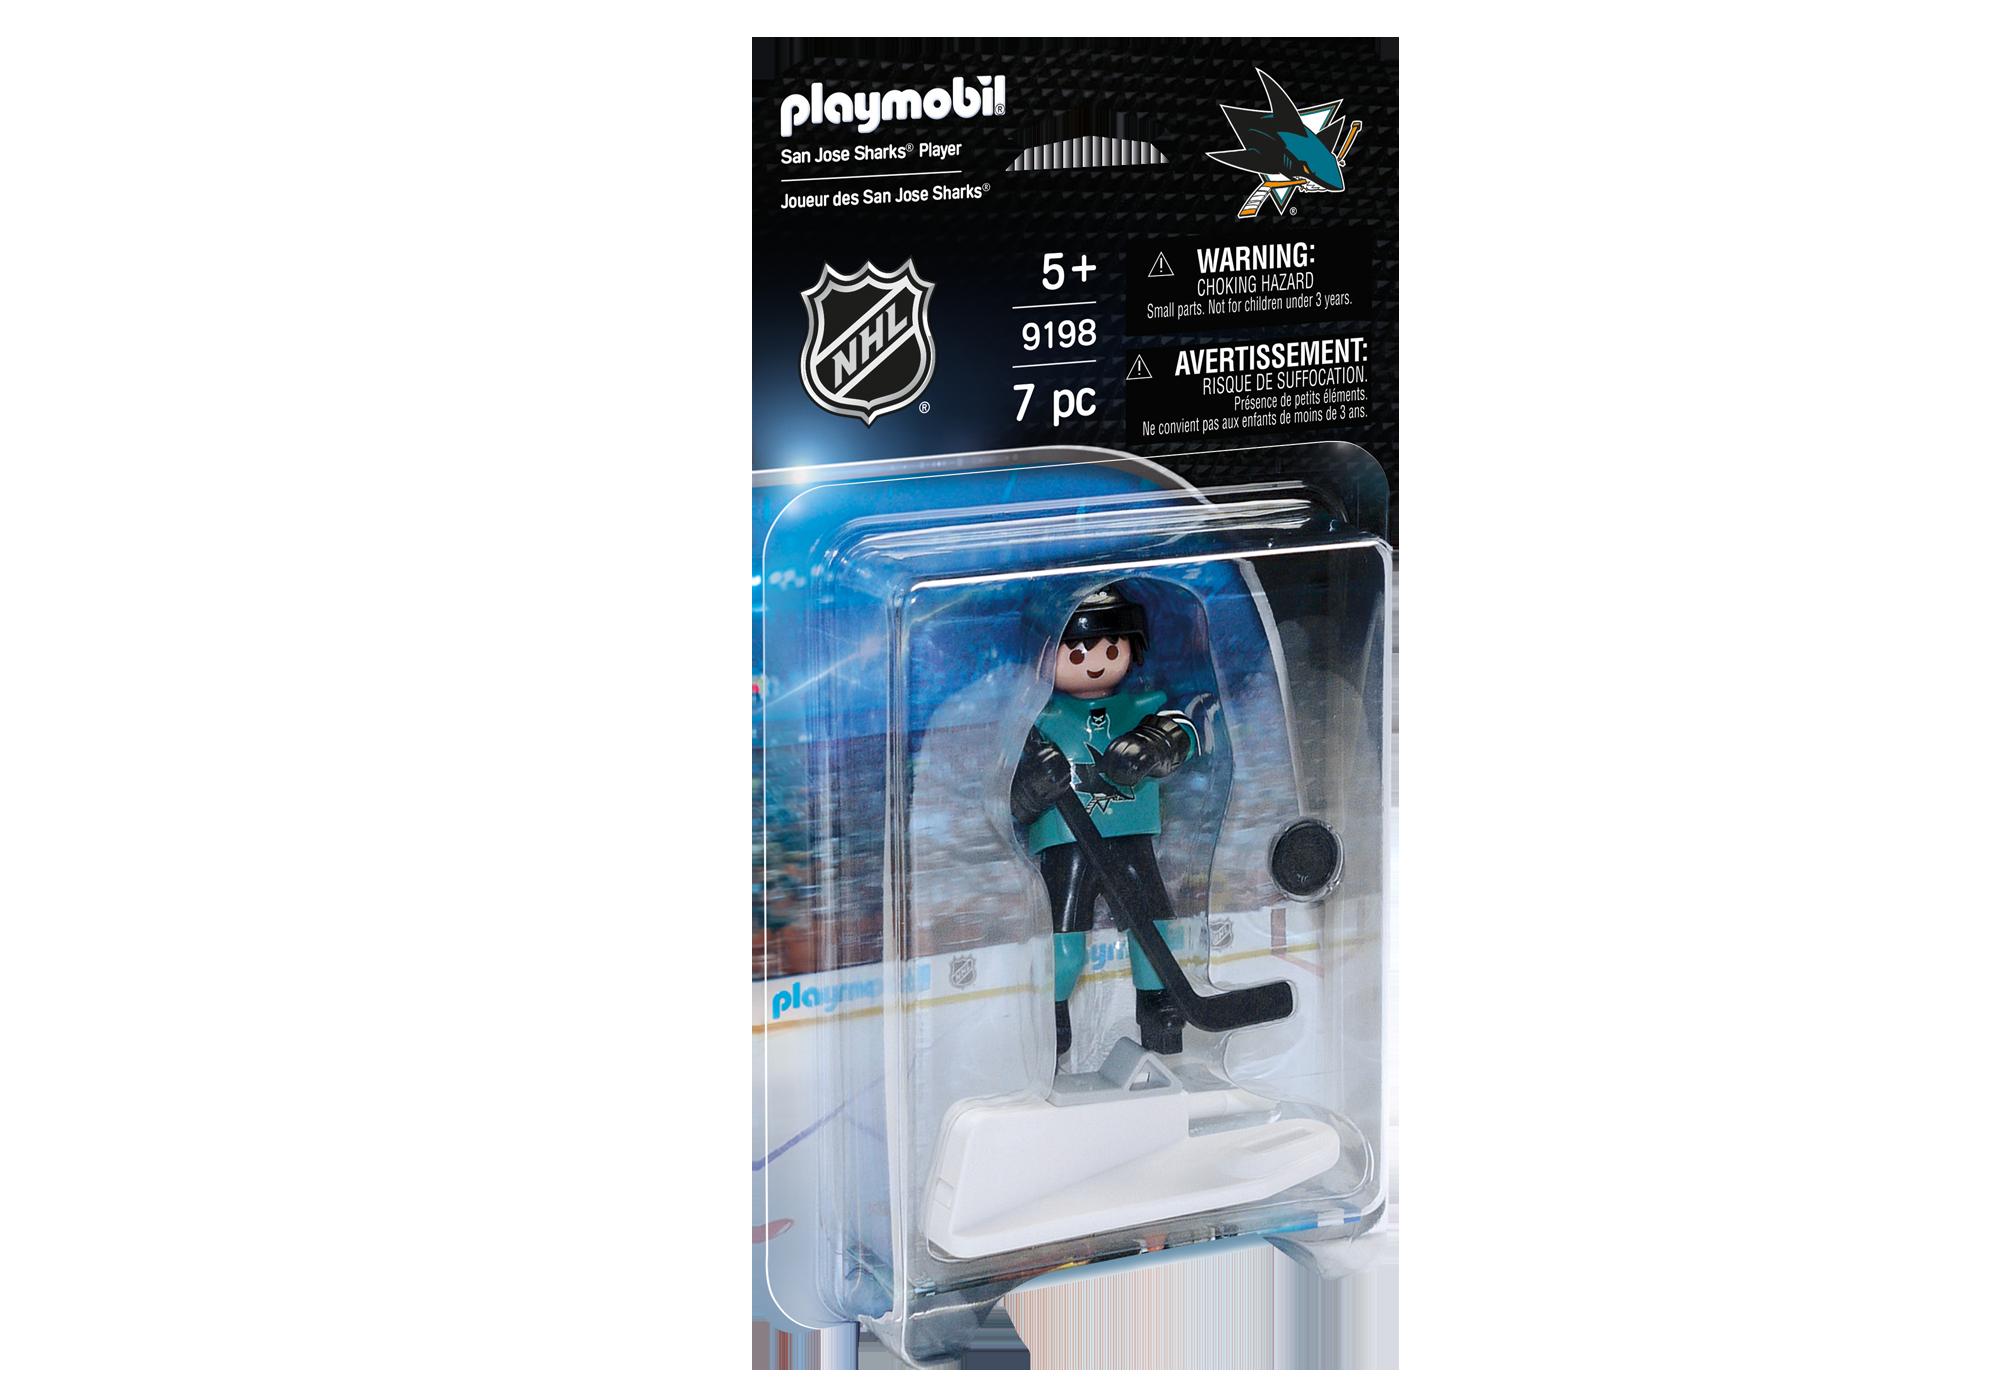 http://media.playmobil.com/i/playmobil/9198_product_box_front/NHL™ San Jose Sharks™ Player